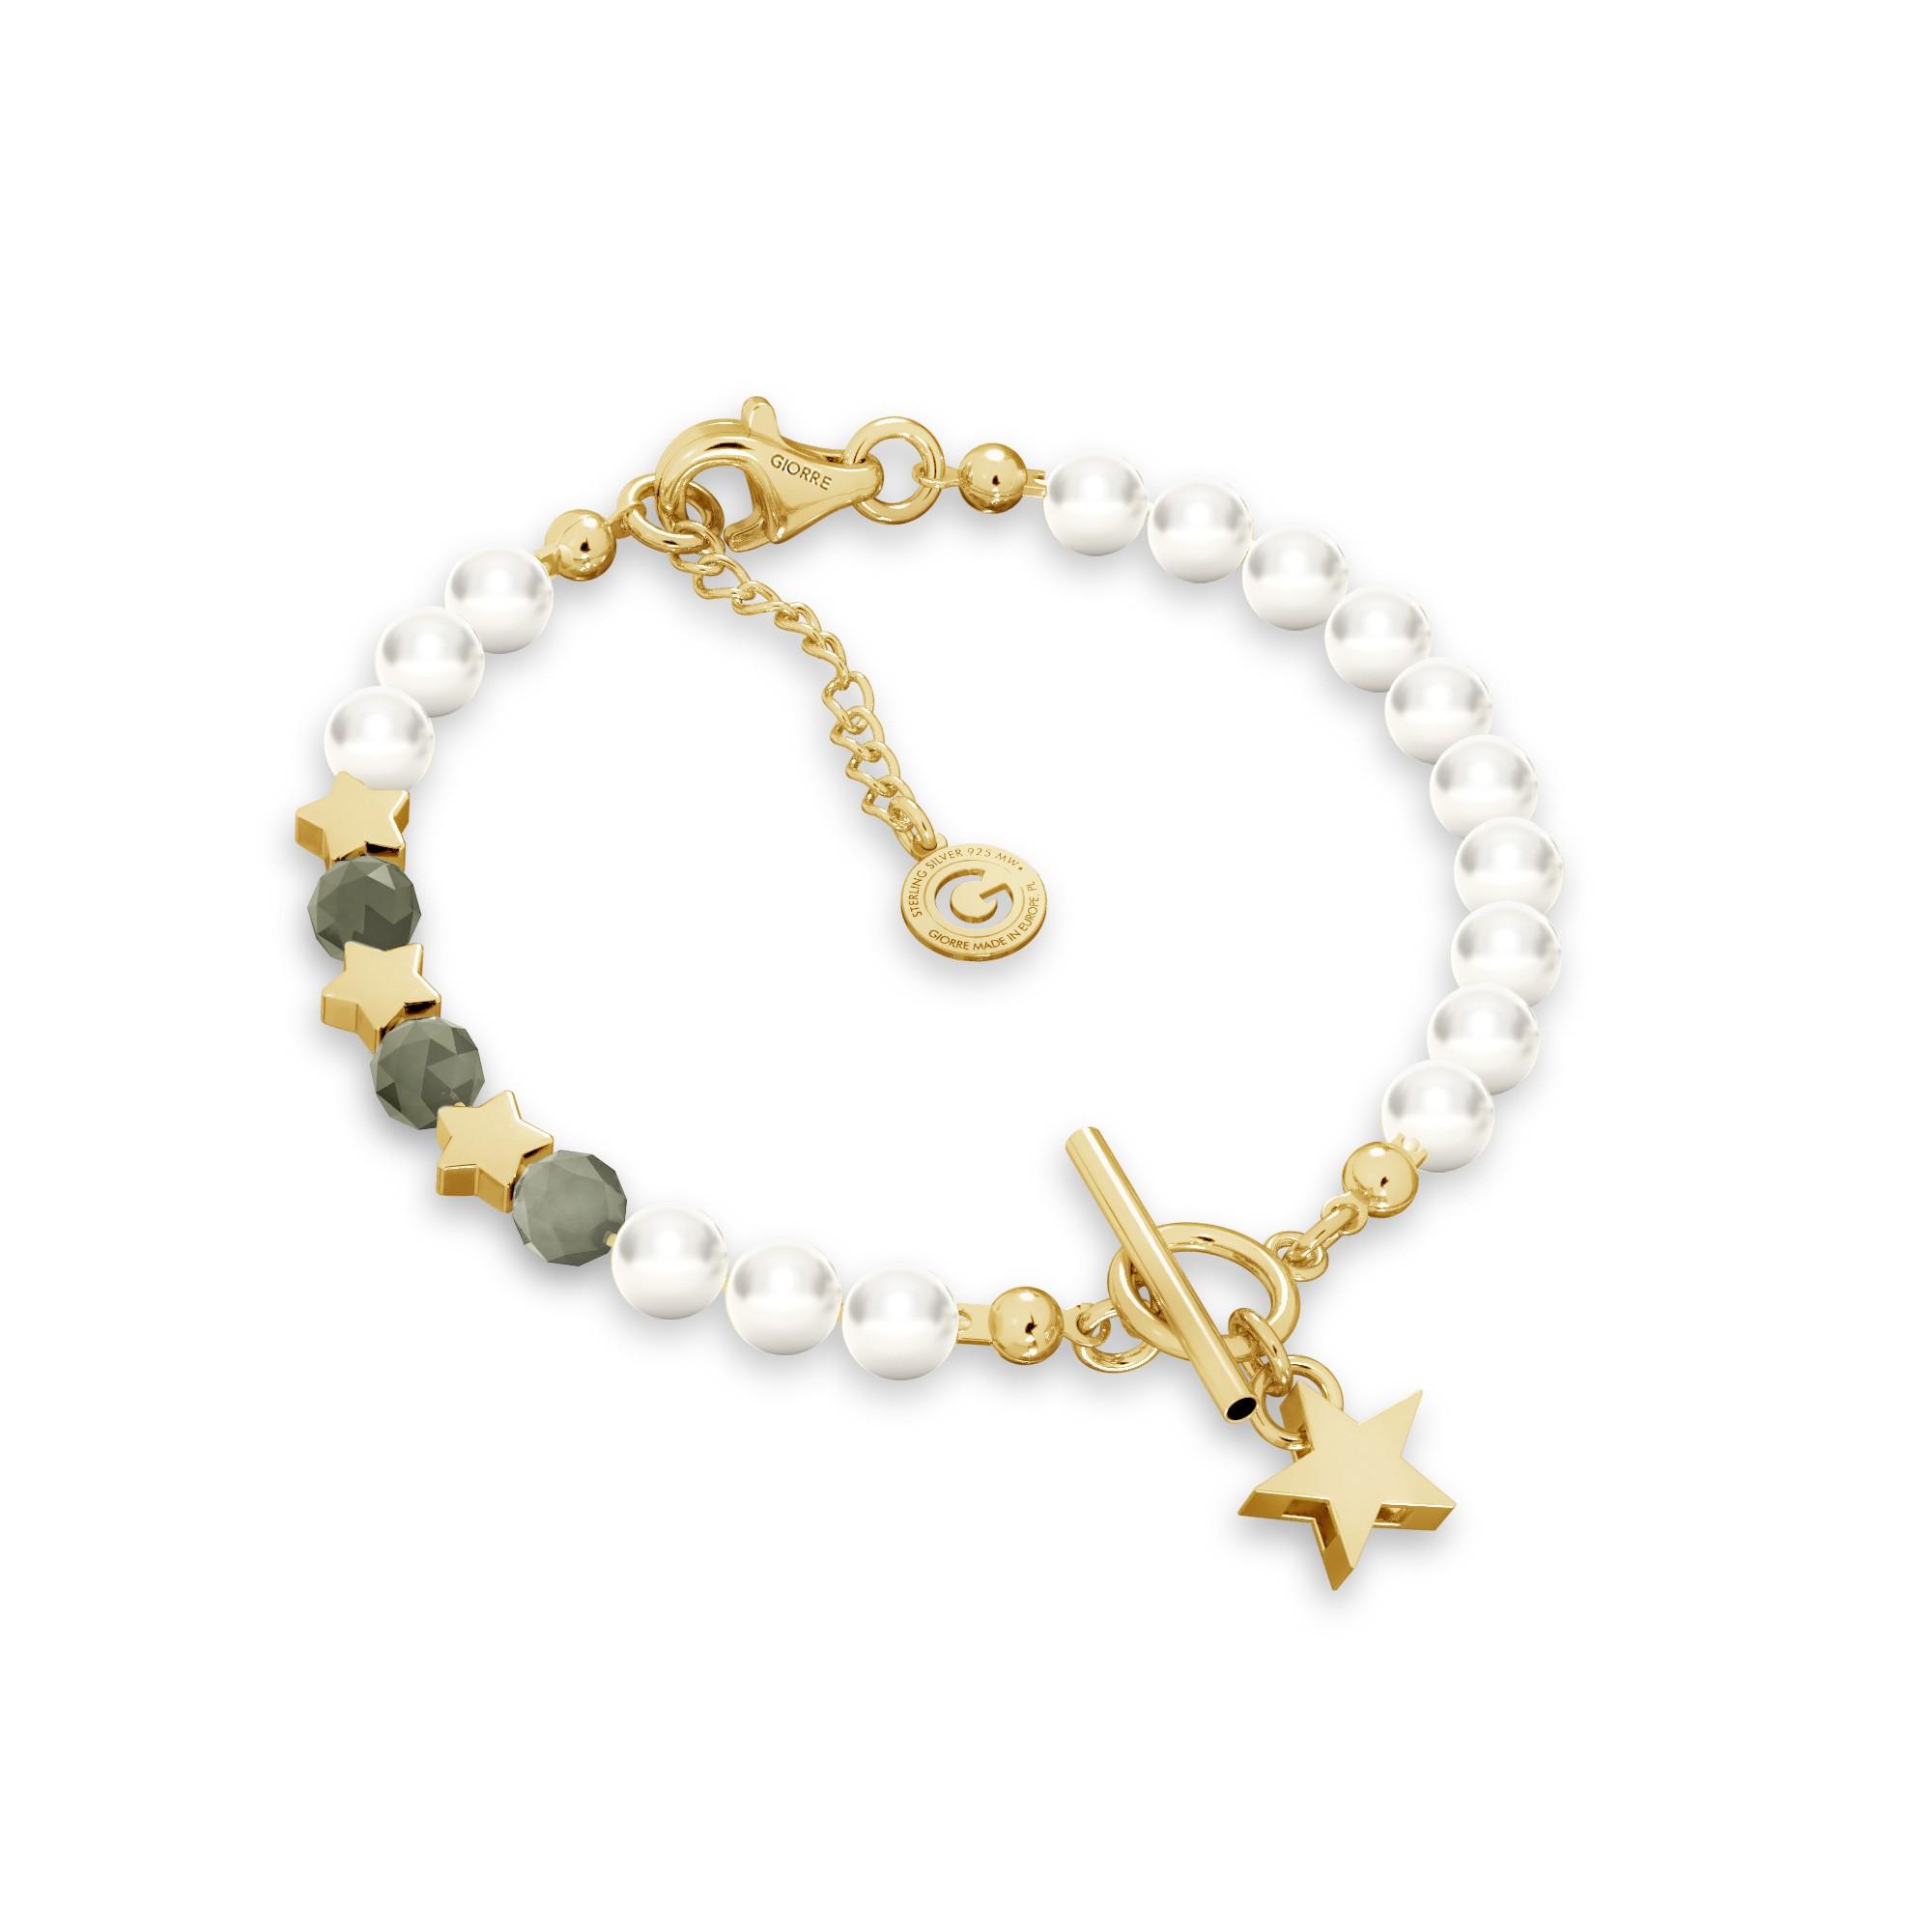 Smaragd perlen armband mit sternen sterling silber 925